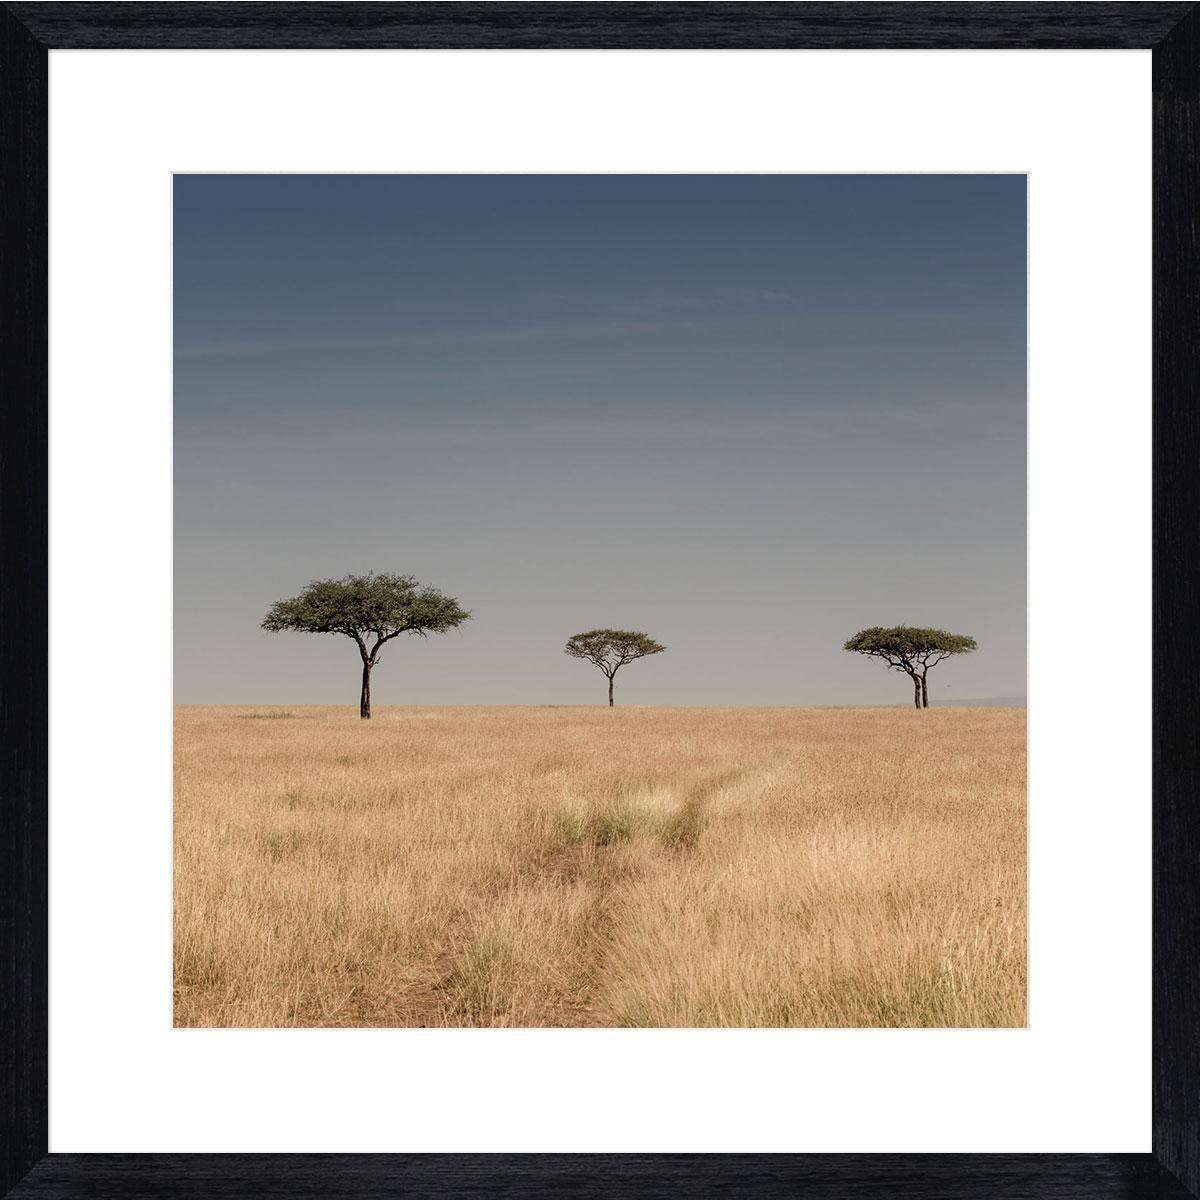 Serengeti Planes, 3 lone trees